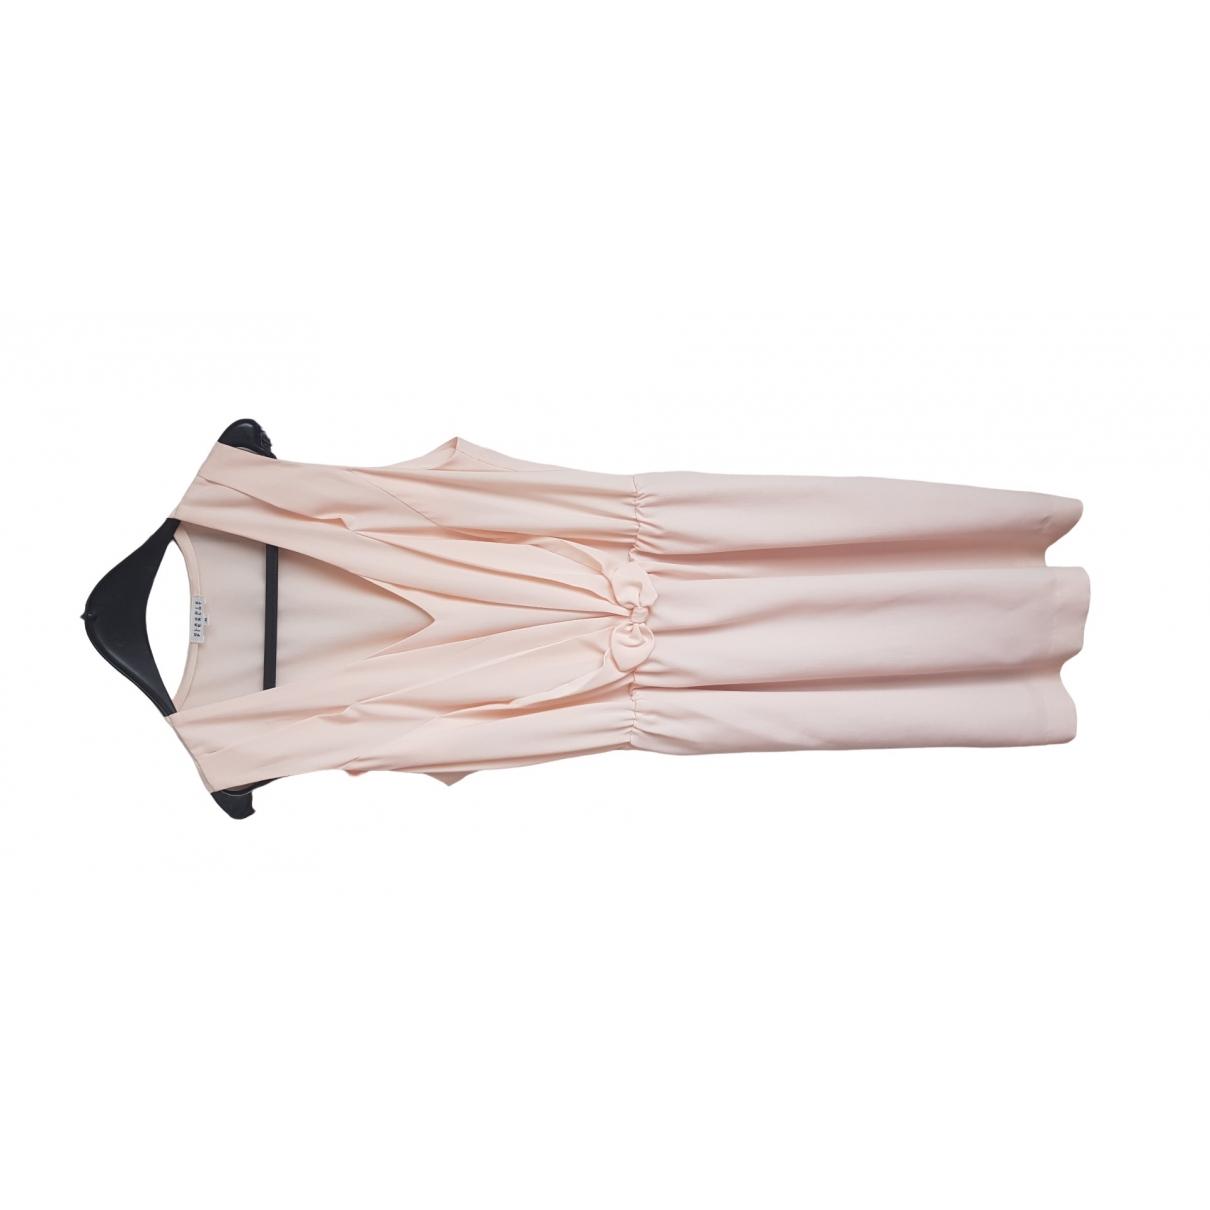 Claudie Pierlot \N Pink dress for Women 36 FR